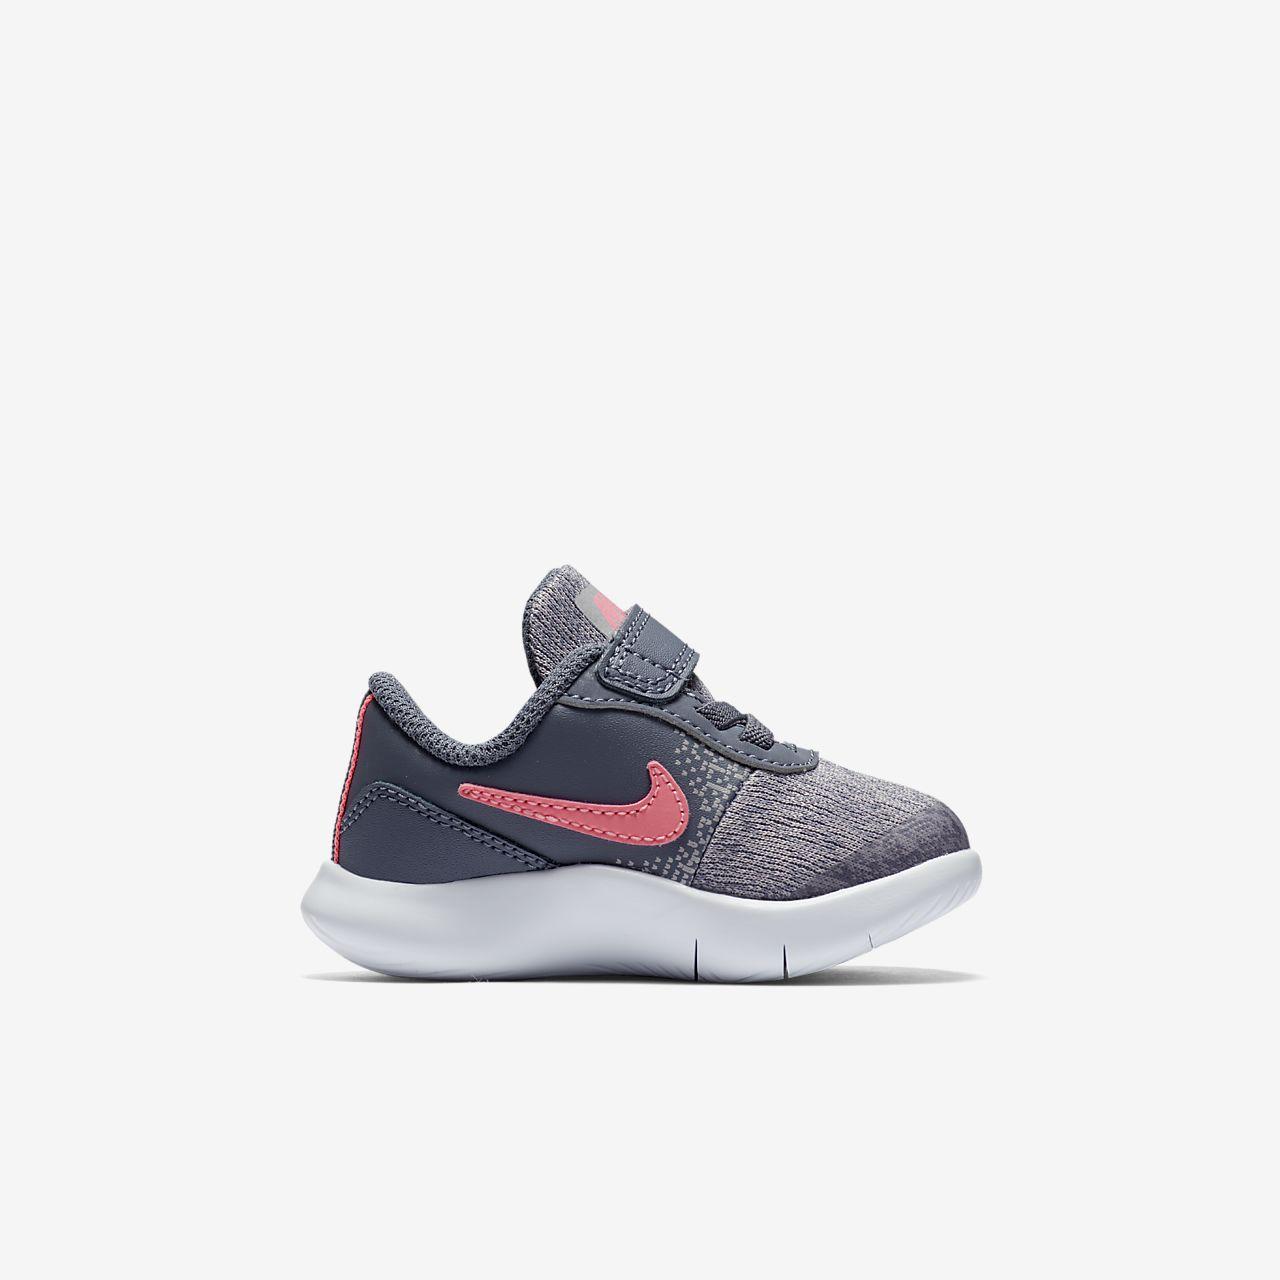 online retailer a98ff 47f2d Nike Baskets Flex Contact Chaussures Enfant 35 - 35